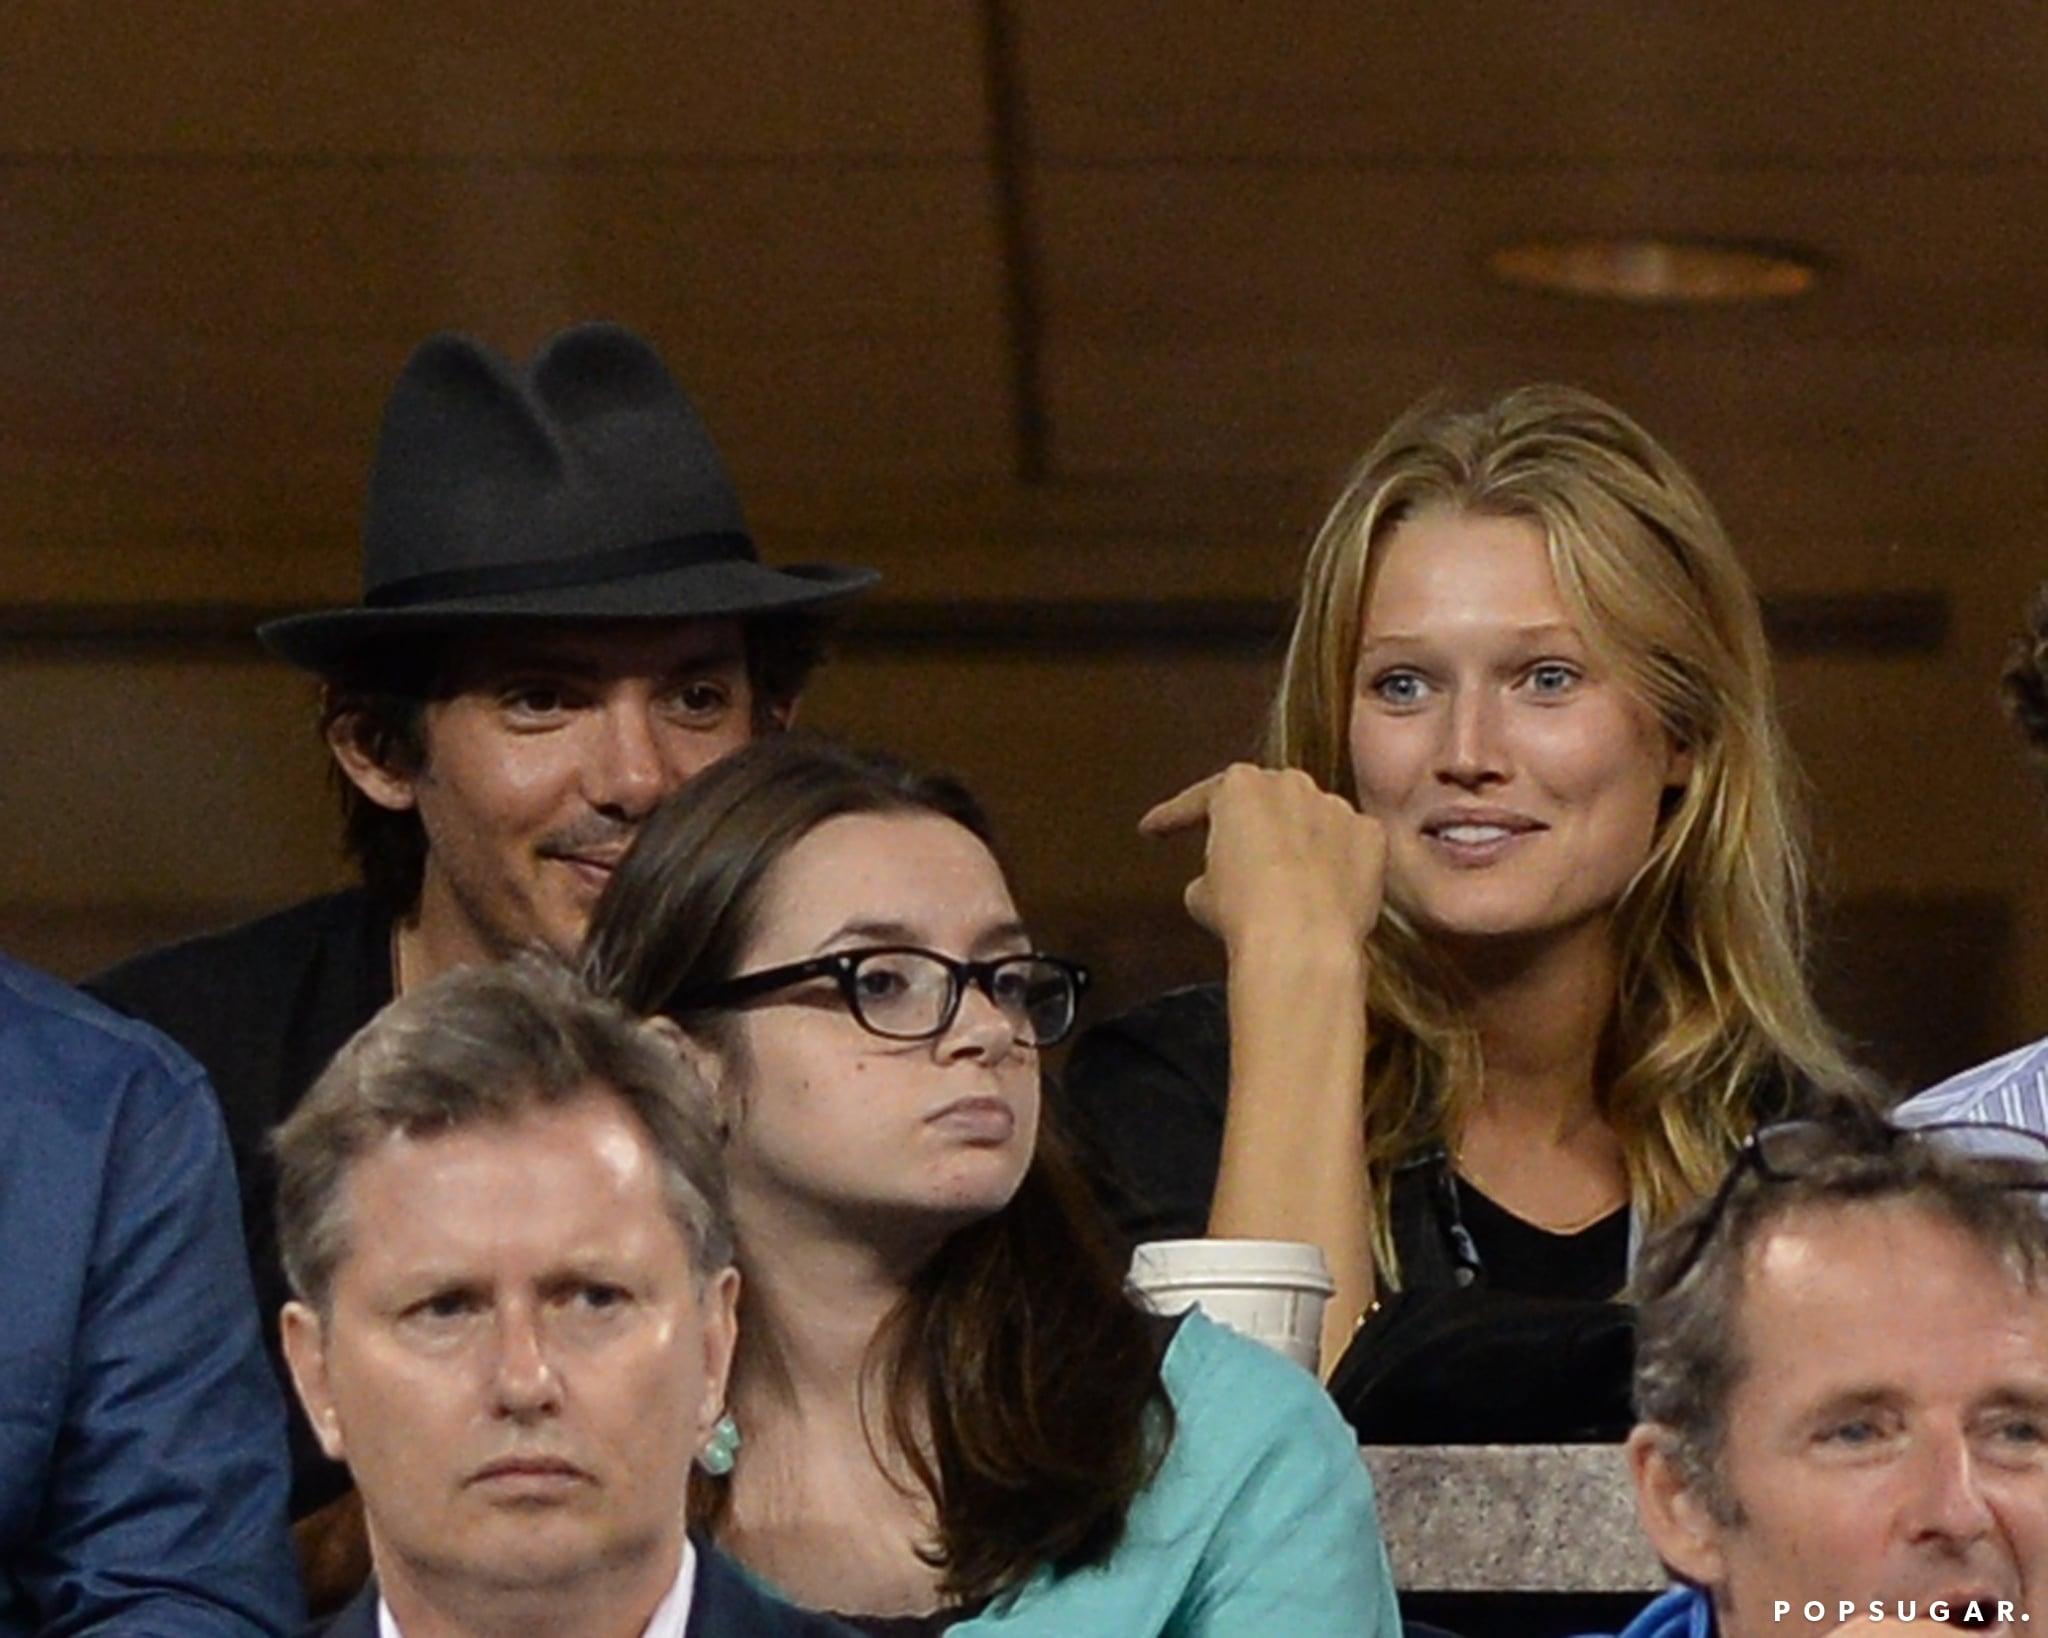 Lukas Haas sat next to Leonardo DiCaprio's girlfriend, Toni Garrn.